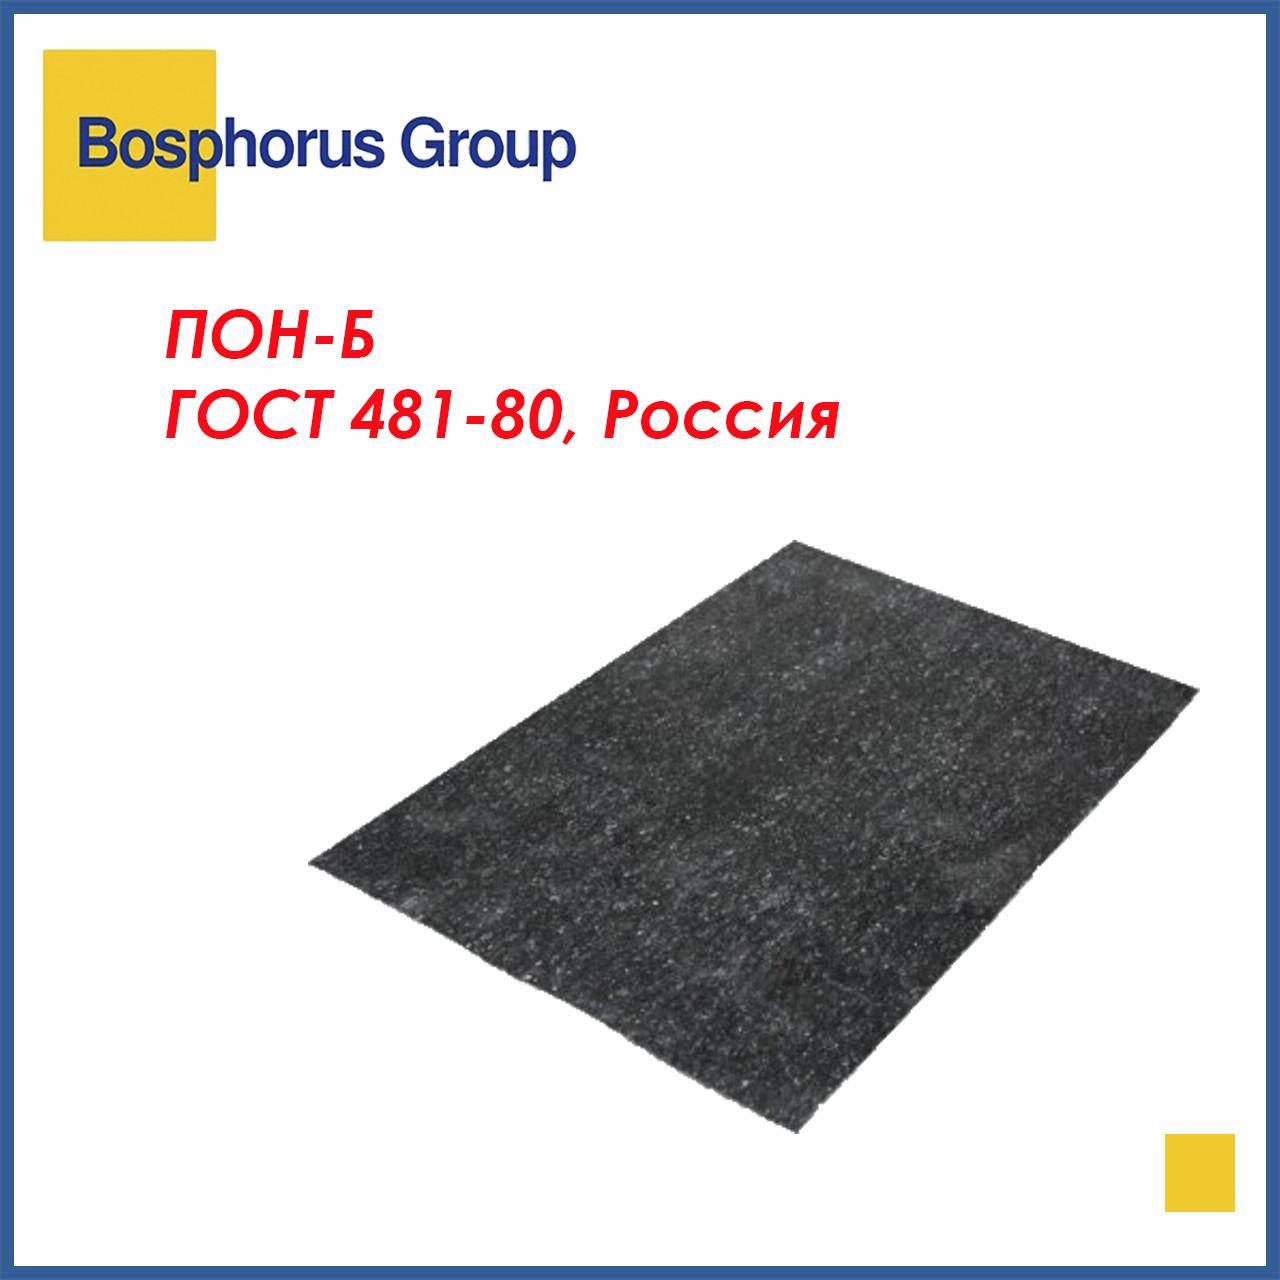 Паронит ПОН Б 1,5 * 1,0 м. Толщина - 3 мм.